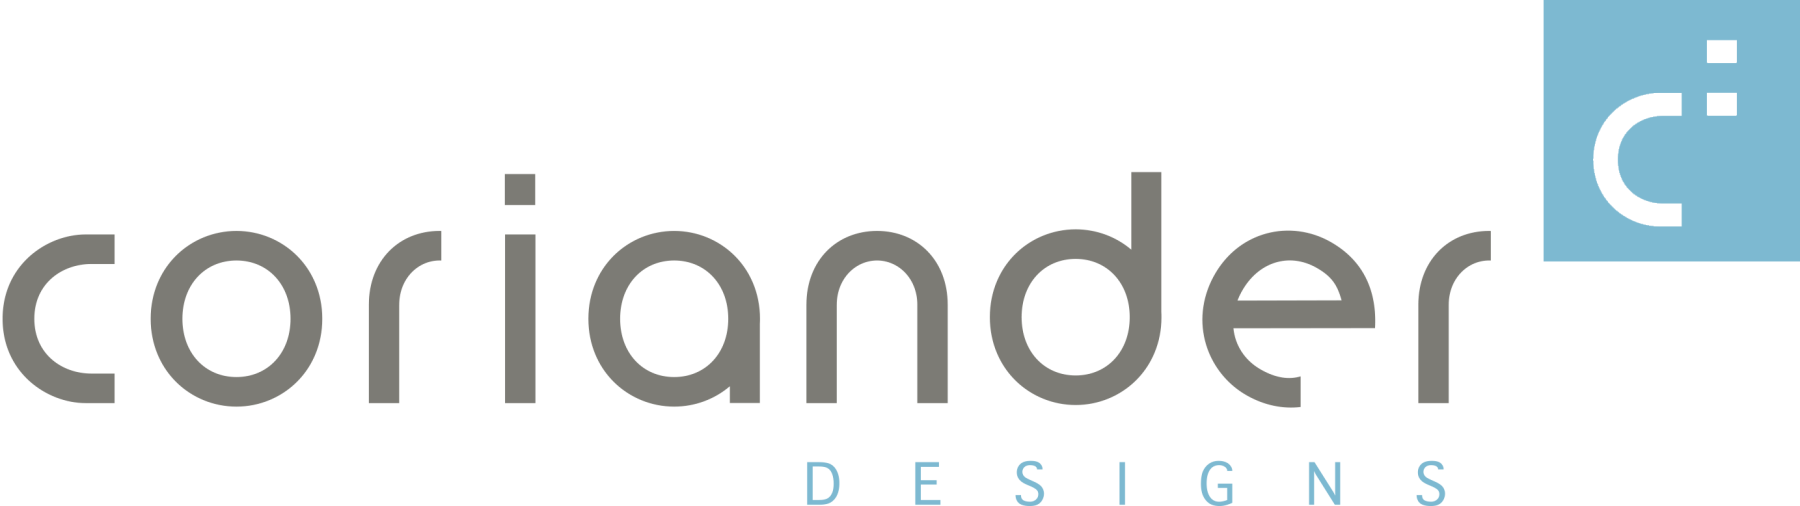 Coriander-logo-blue.png